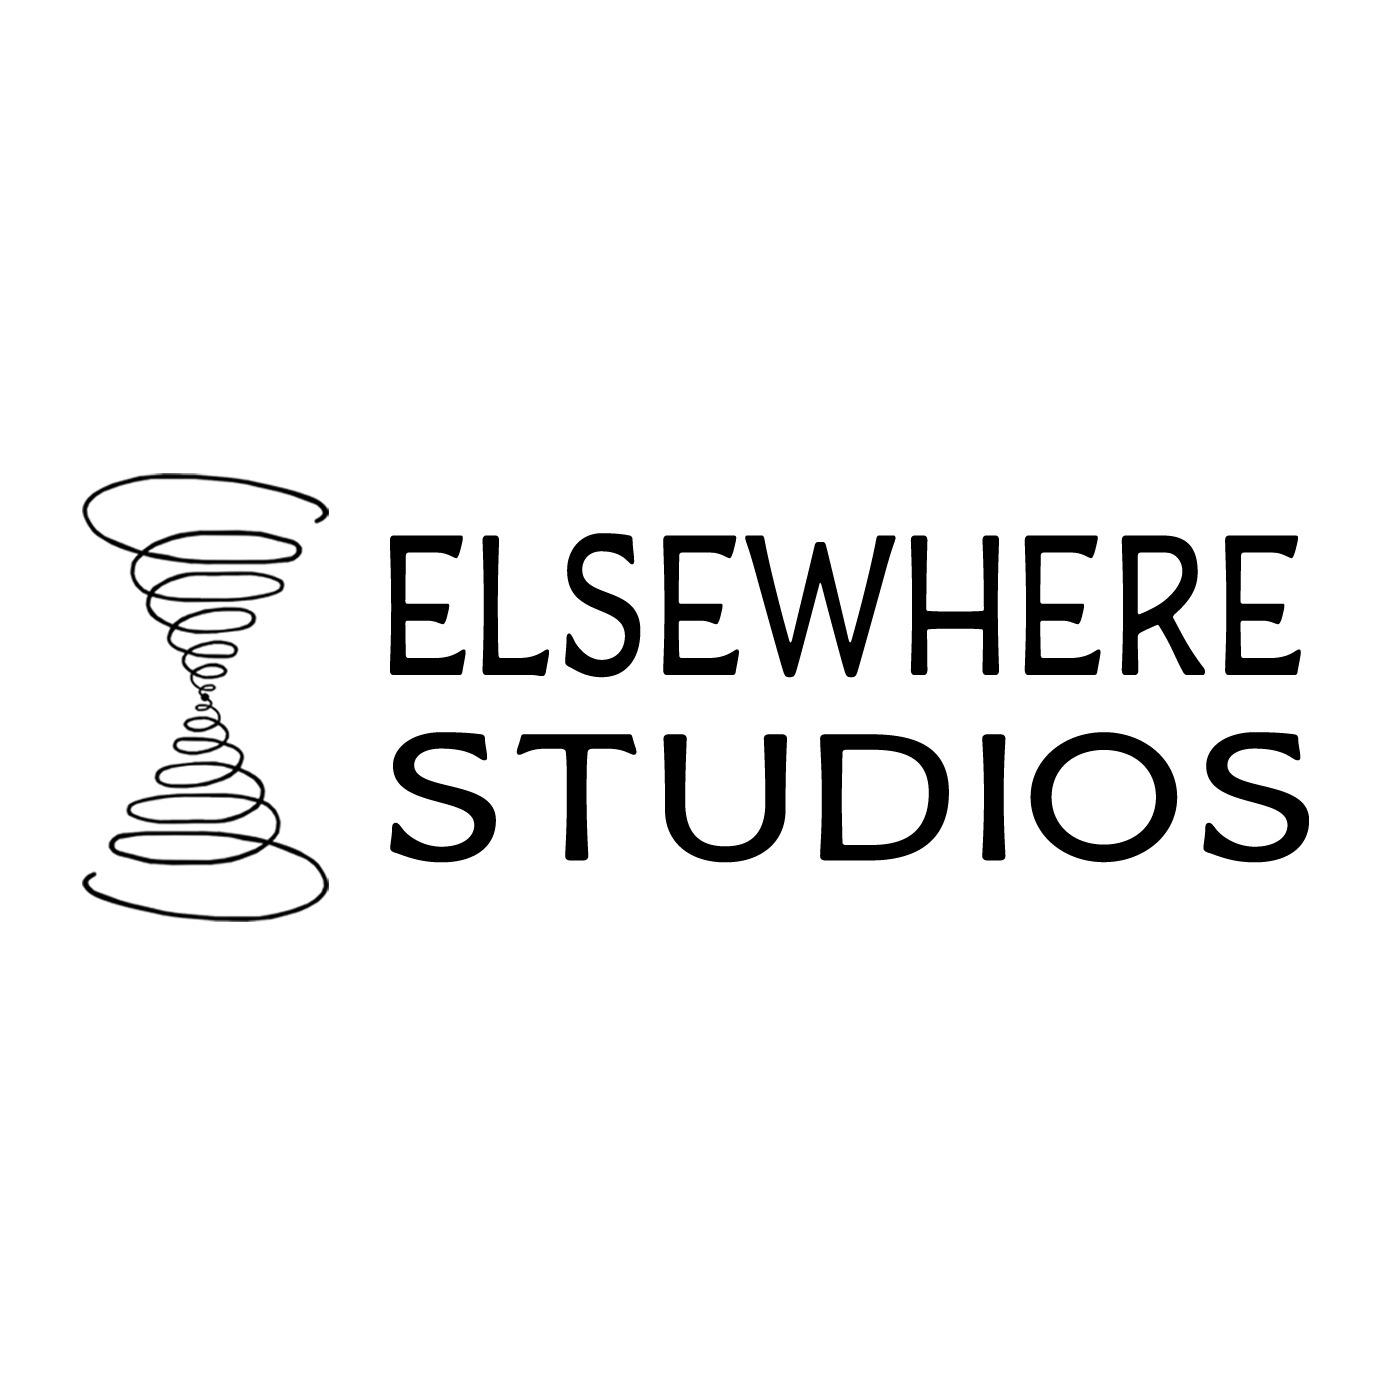 Elsewhere Studios